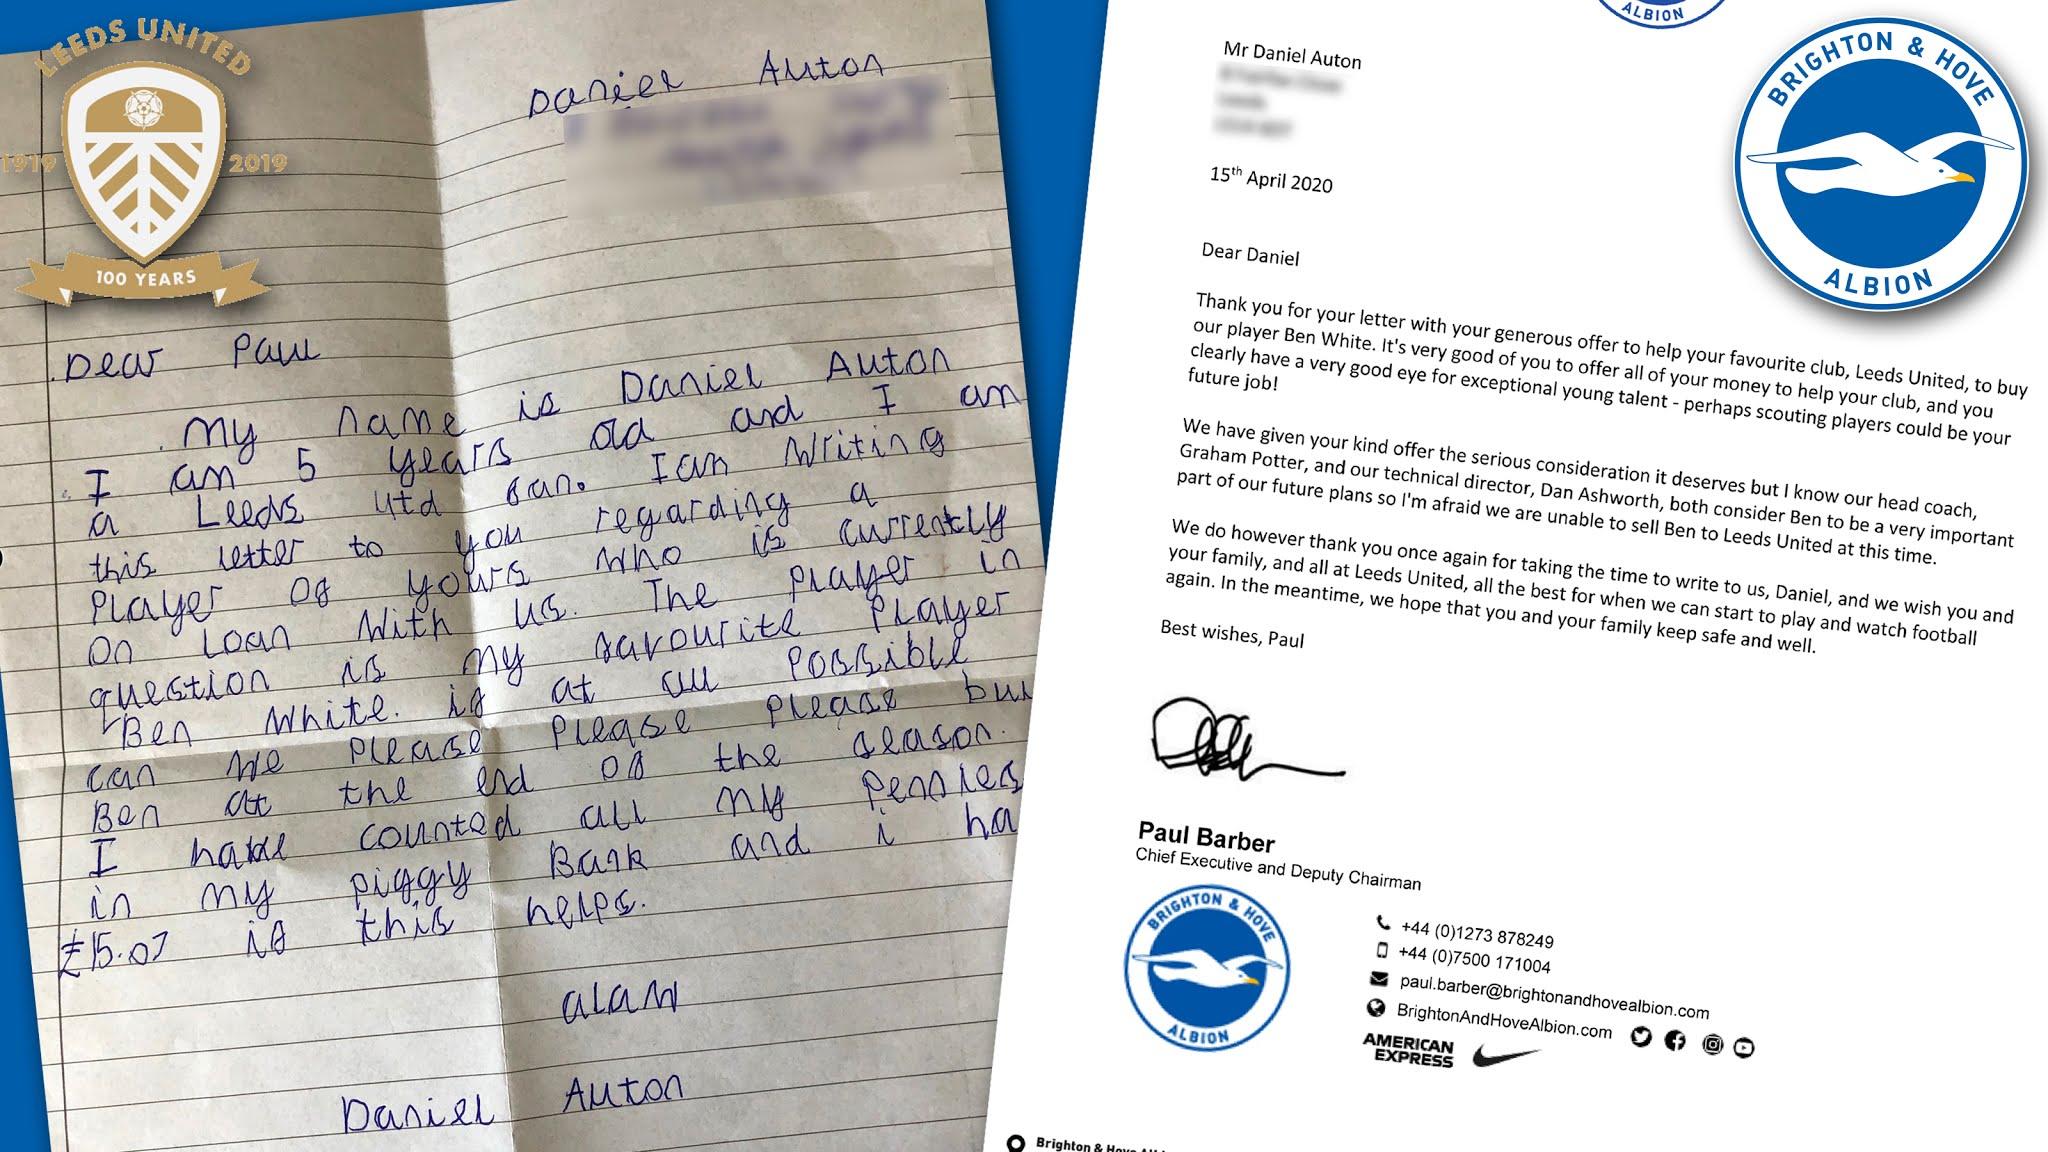 Five-year-old Leeds fan offers pocket money to buy on-loan defender Ben White